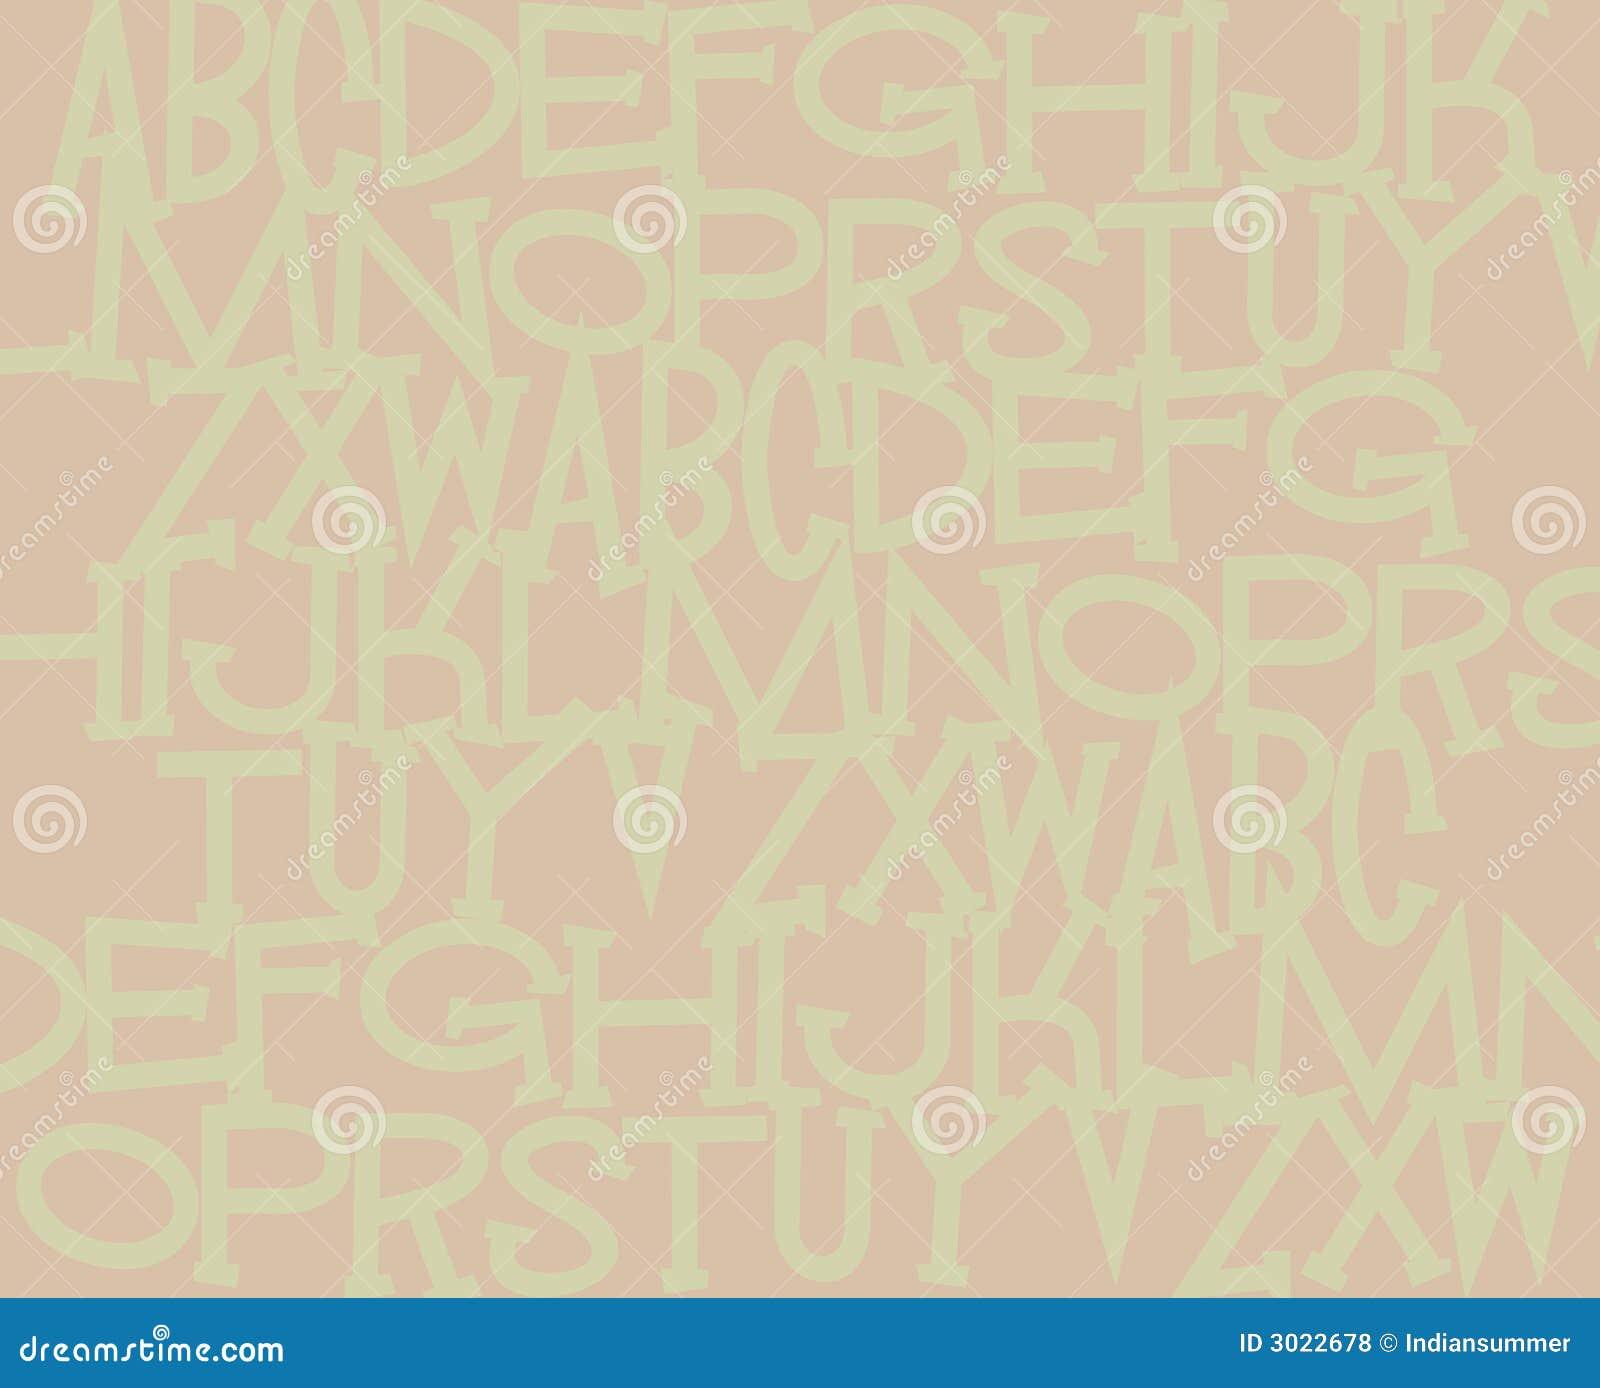 Fondo del alfabeto